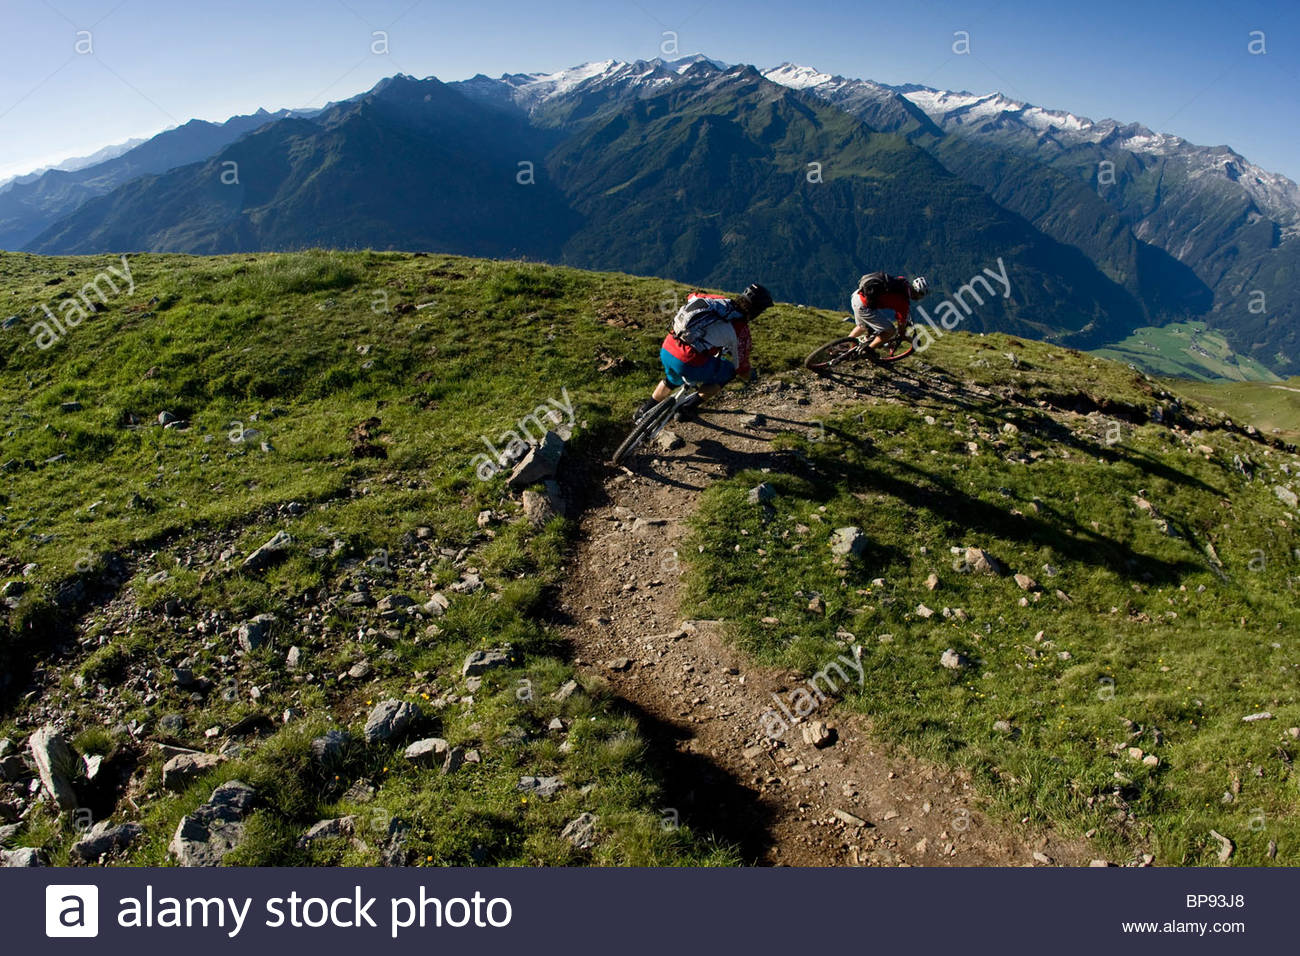 Two mountain bikers in mountain scenery, Neukirchen am Grossvenediger, Pinzgau, Salzburg state, Austria - Stock Image